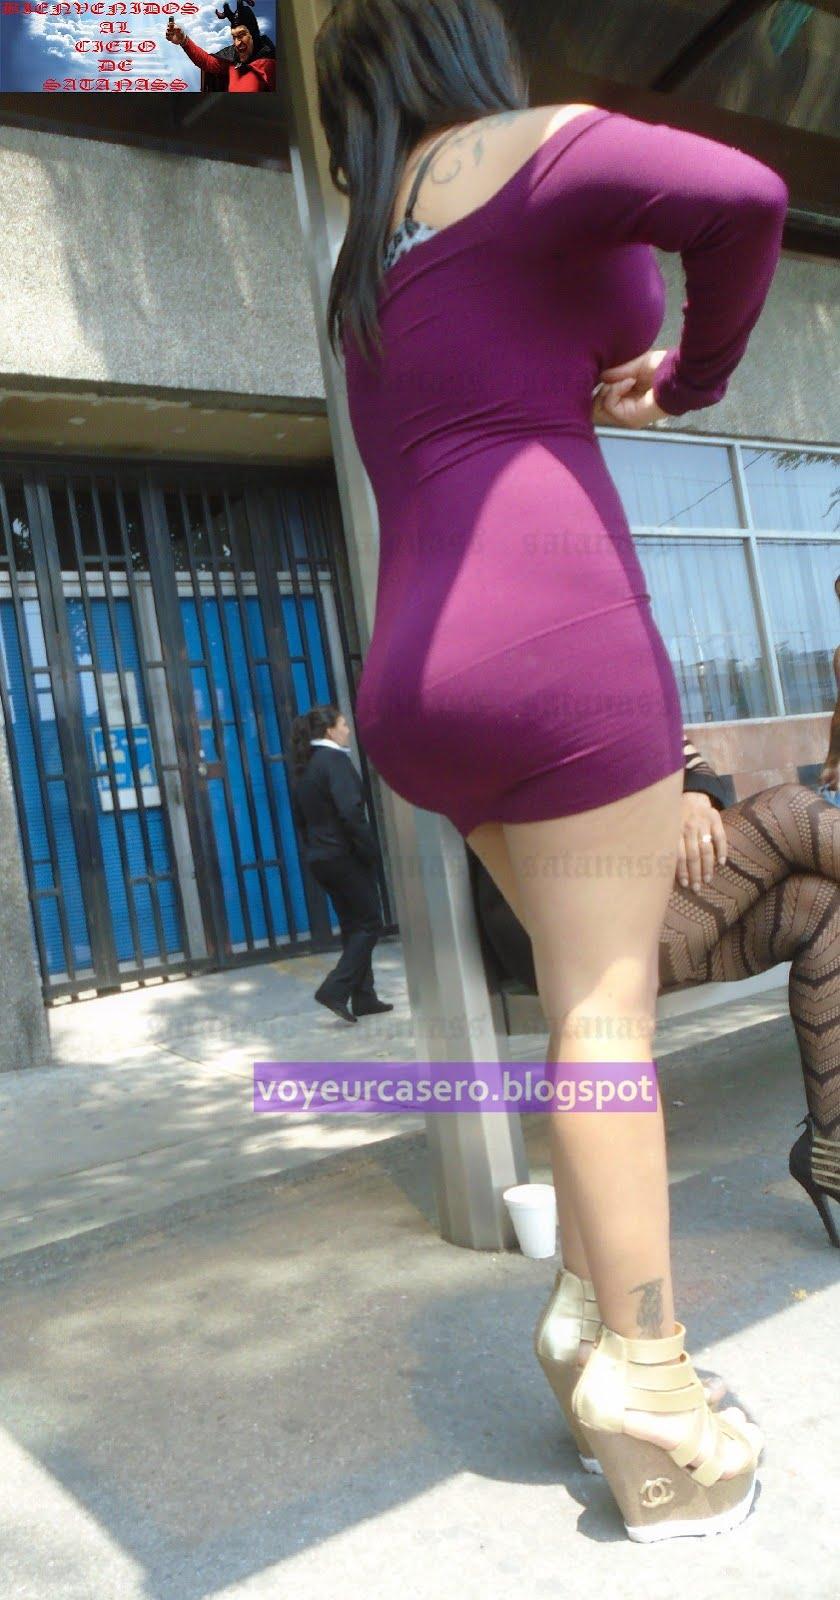 culonas blogspot prostituta